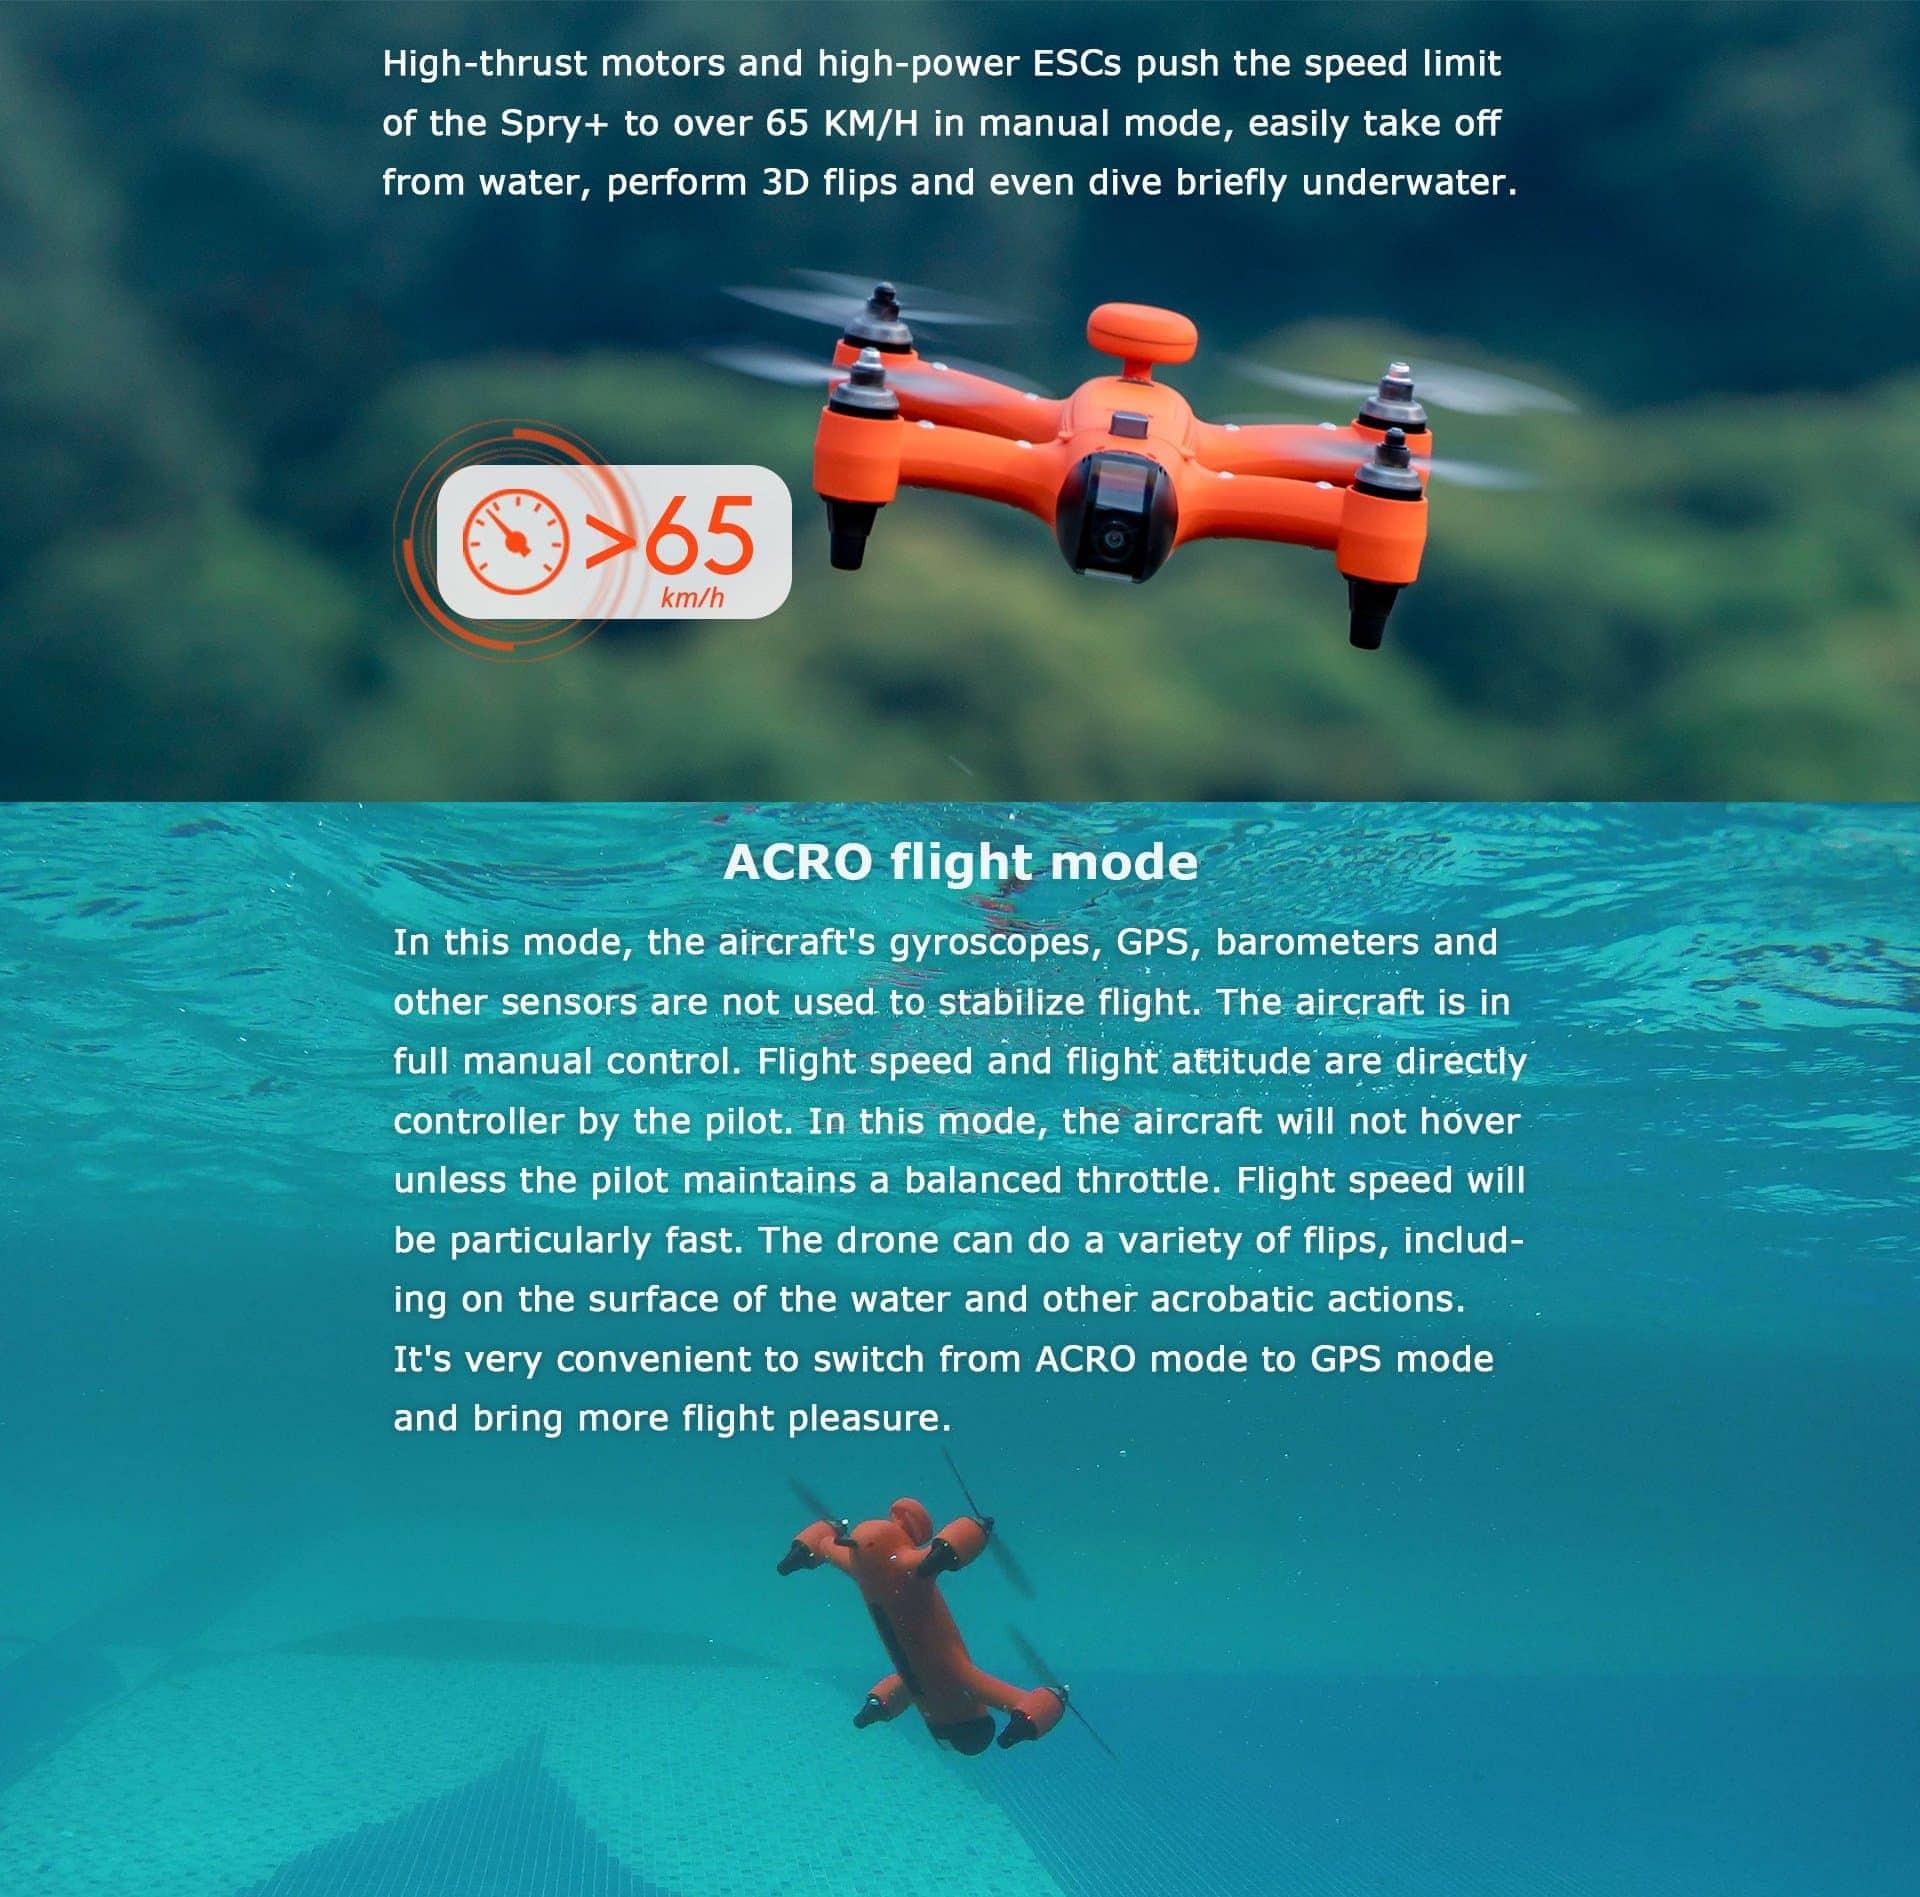 SwellPro - Spry+ ACRO Flight Mode